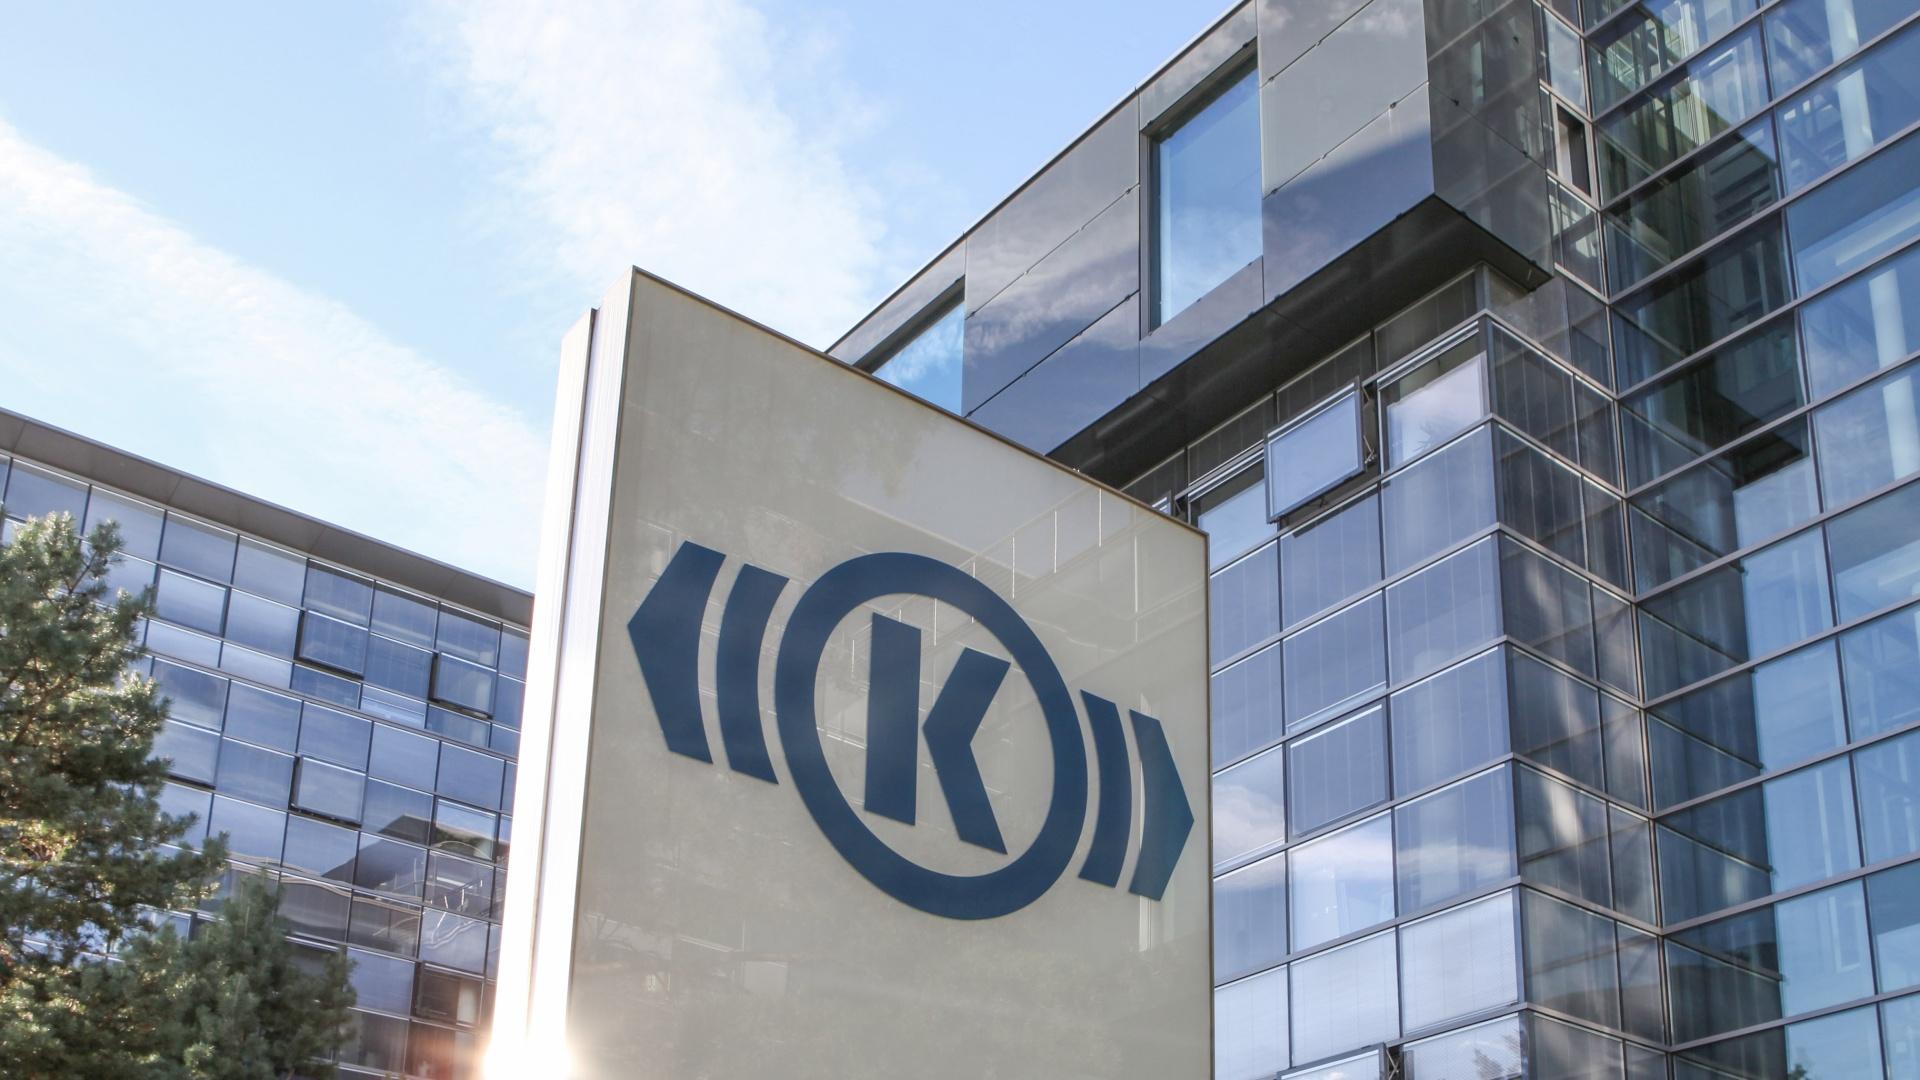 Knorr Bremse photo bureaux siège